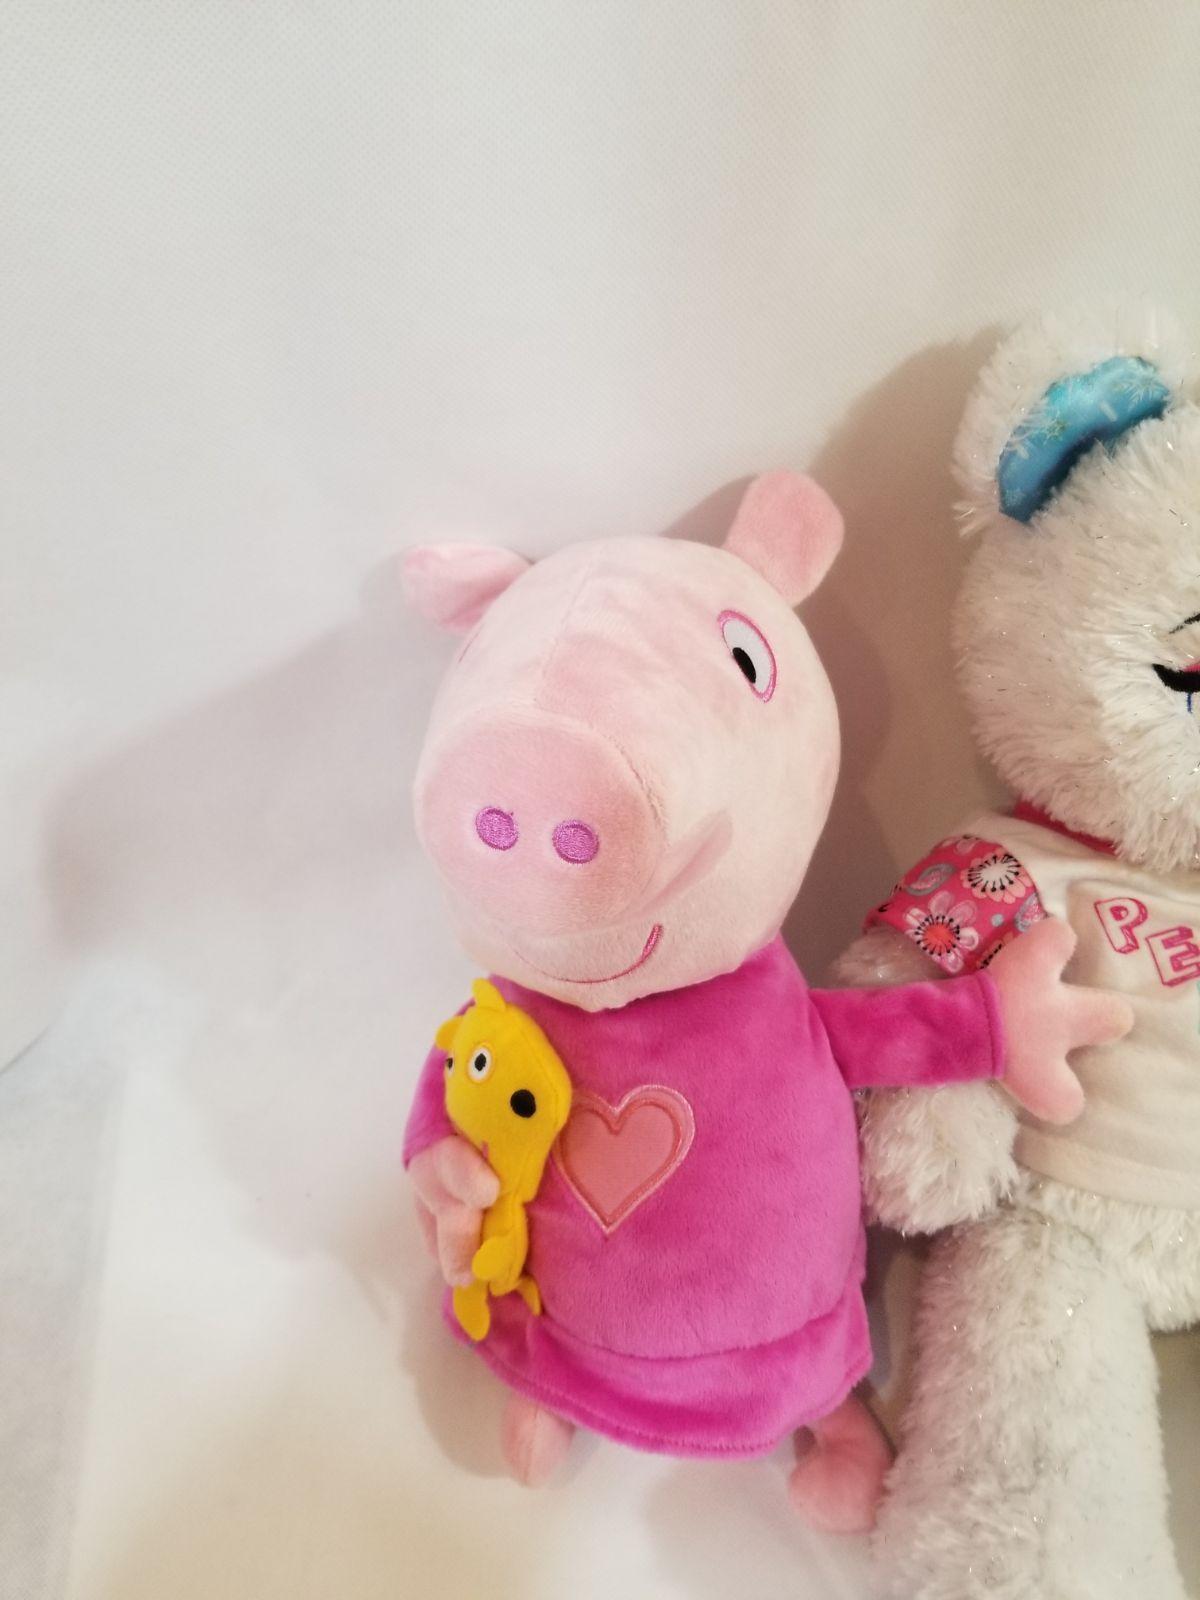 "Peppa Pig Sleep N' Oink 12"" Plush Talking Music Lullaby + Disney Frozen bear toy"